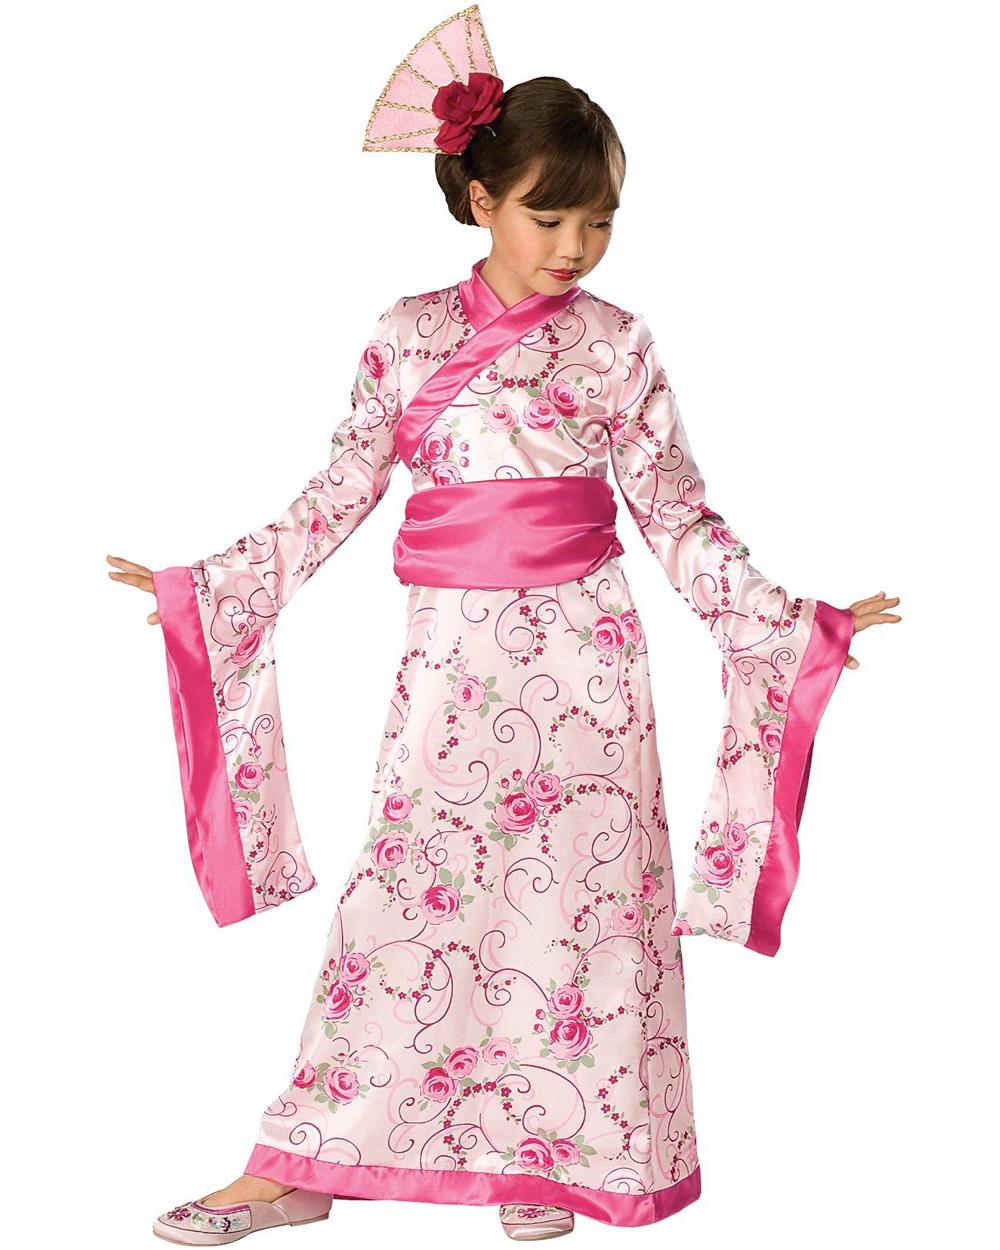 CK358 Child Asian Princess Japanese Girls Kimono Geisha Fancy Dress Up Costume